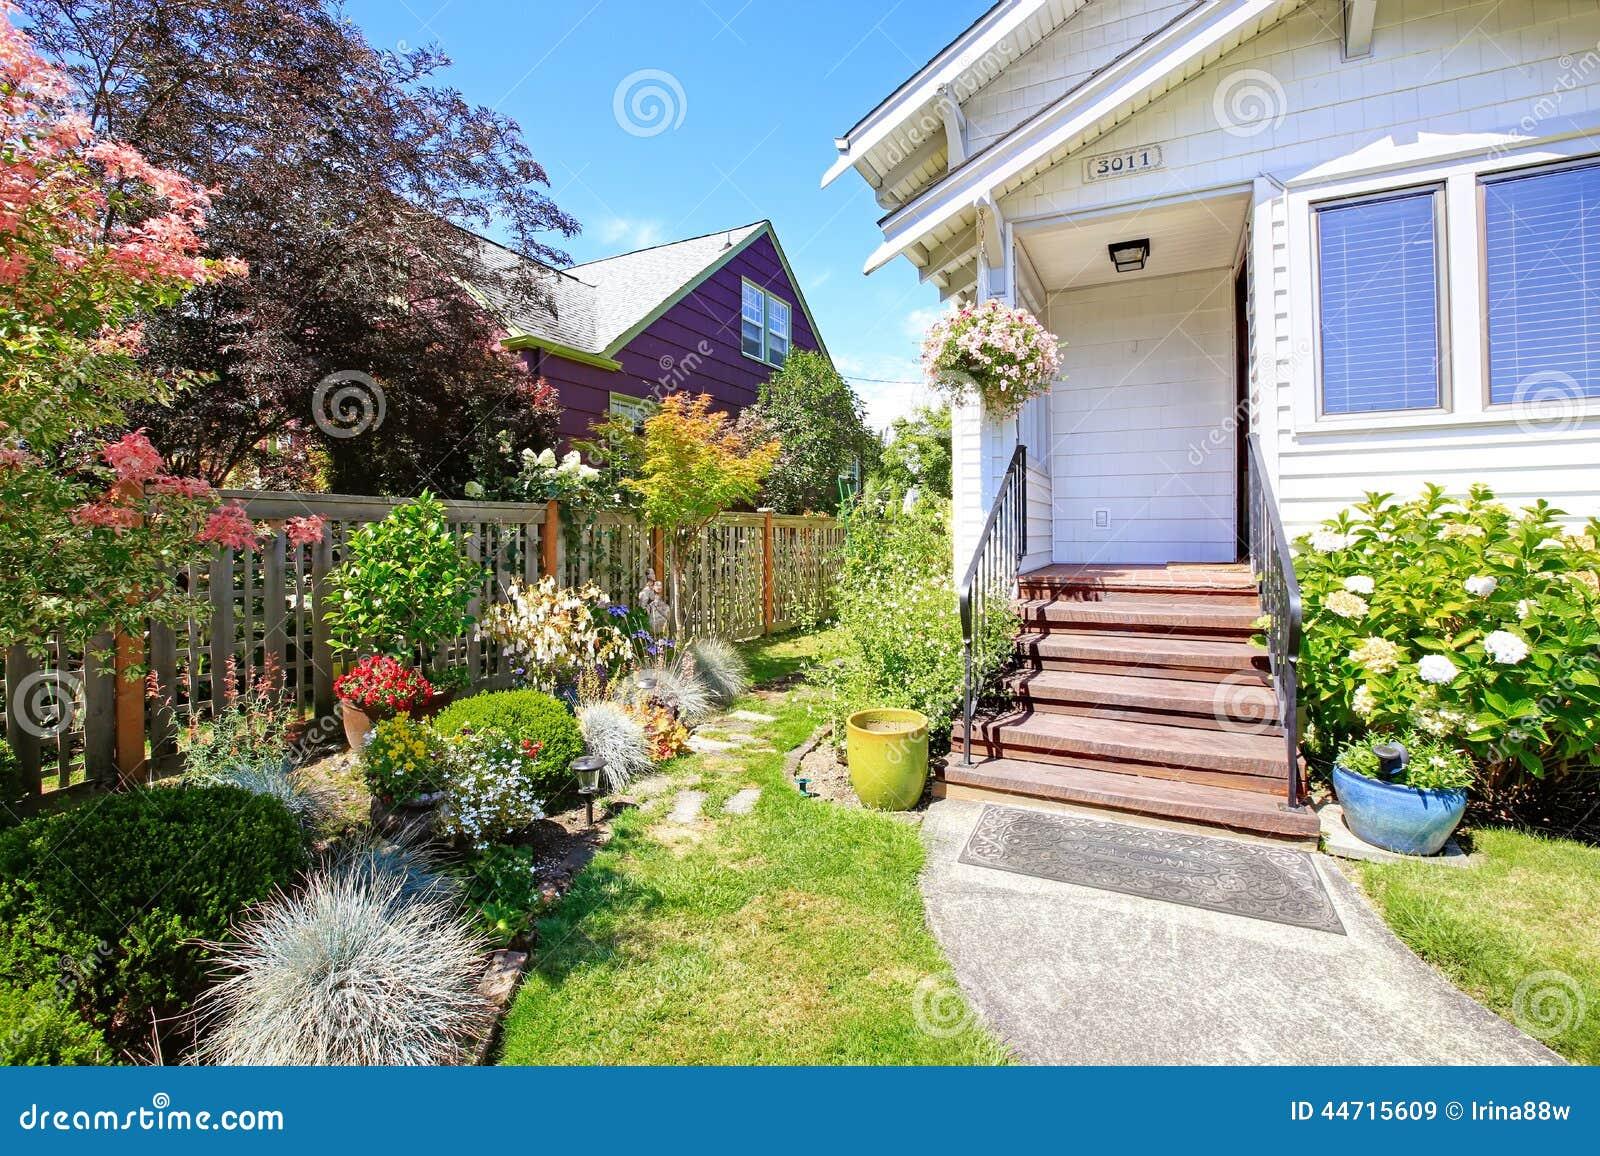 cama casa entrada escaleras exterior